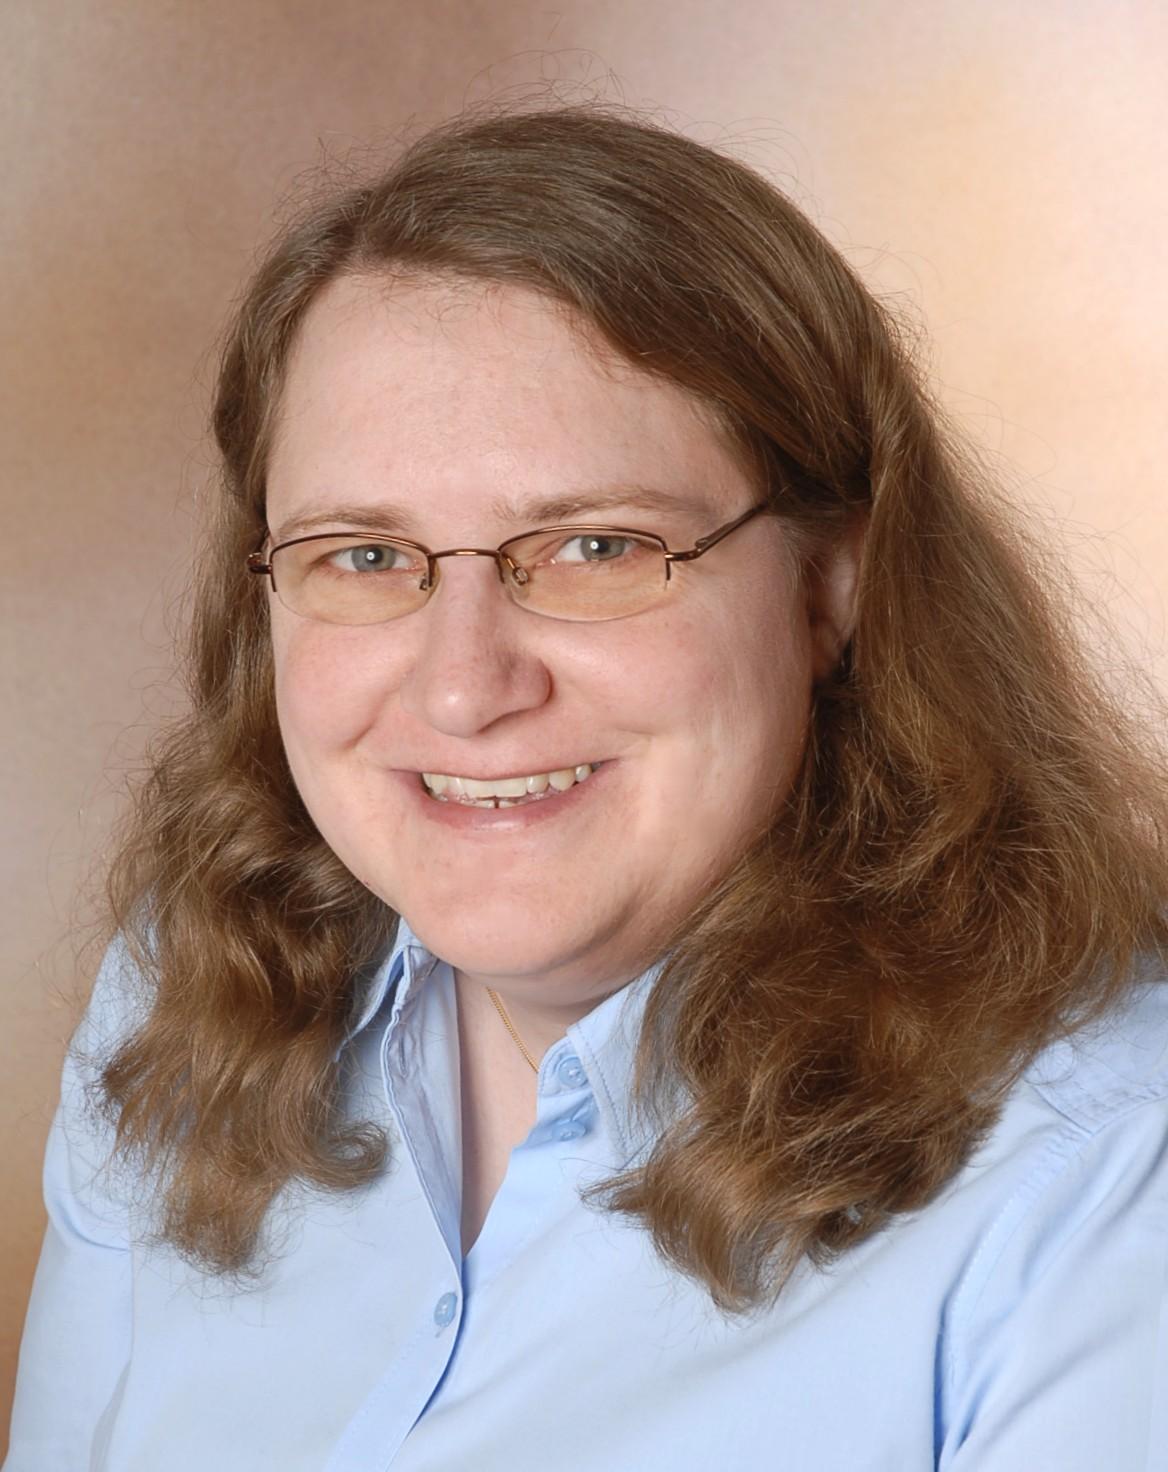 Svenja Bunt